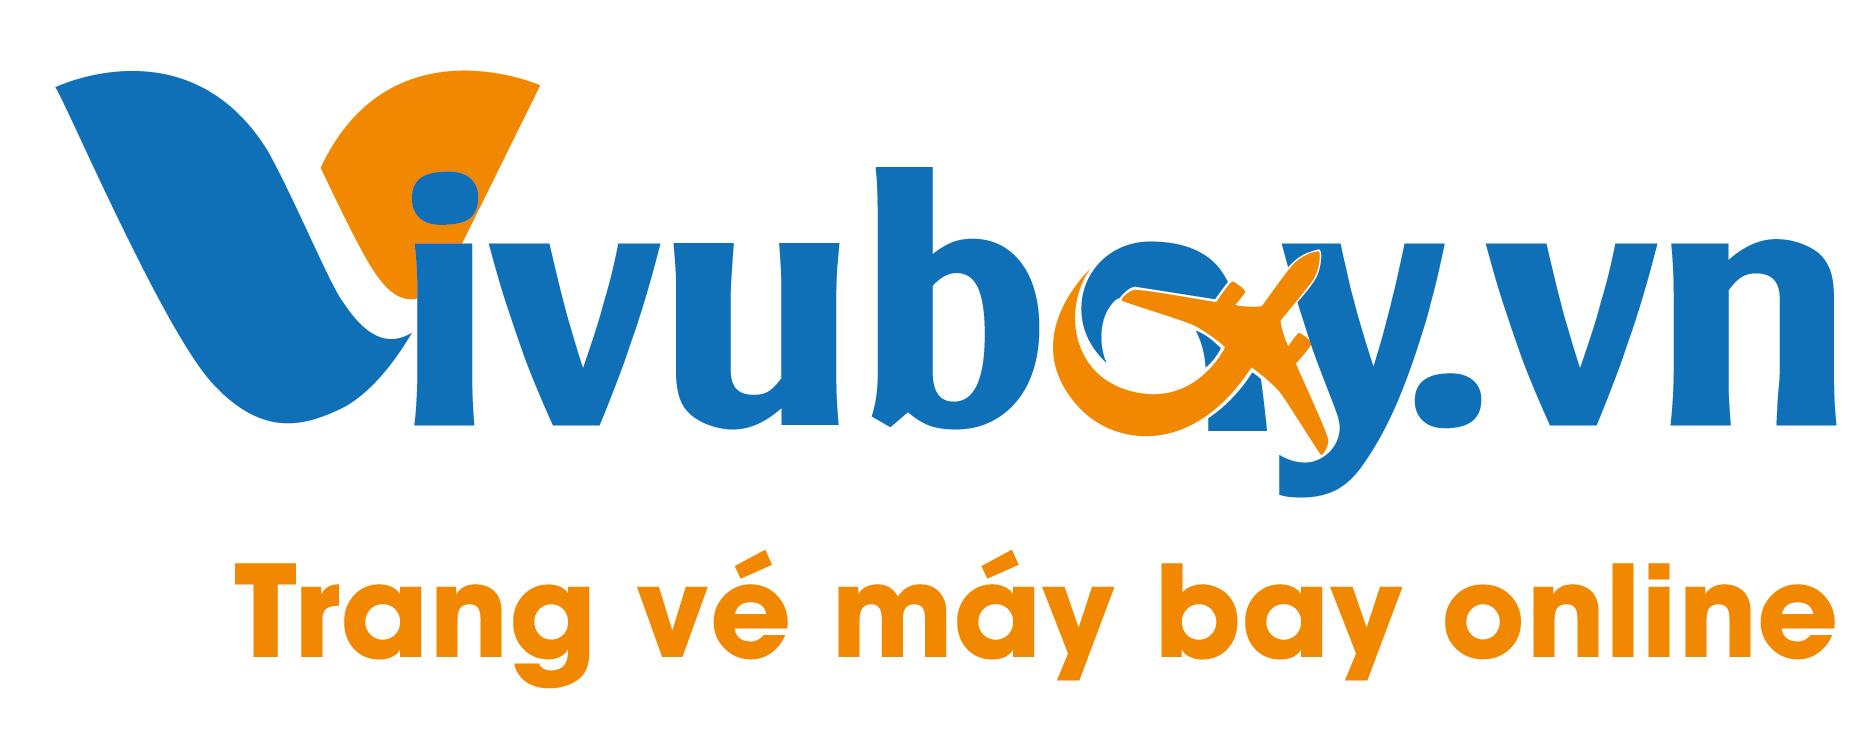 Giới thiệu Vivubay